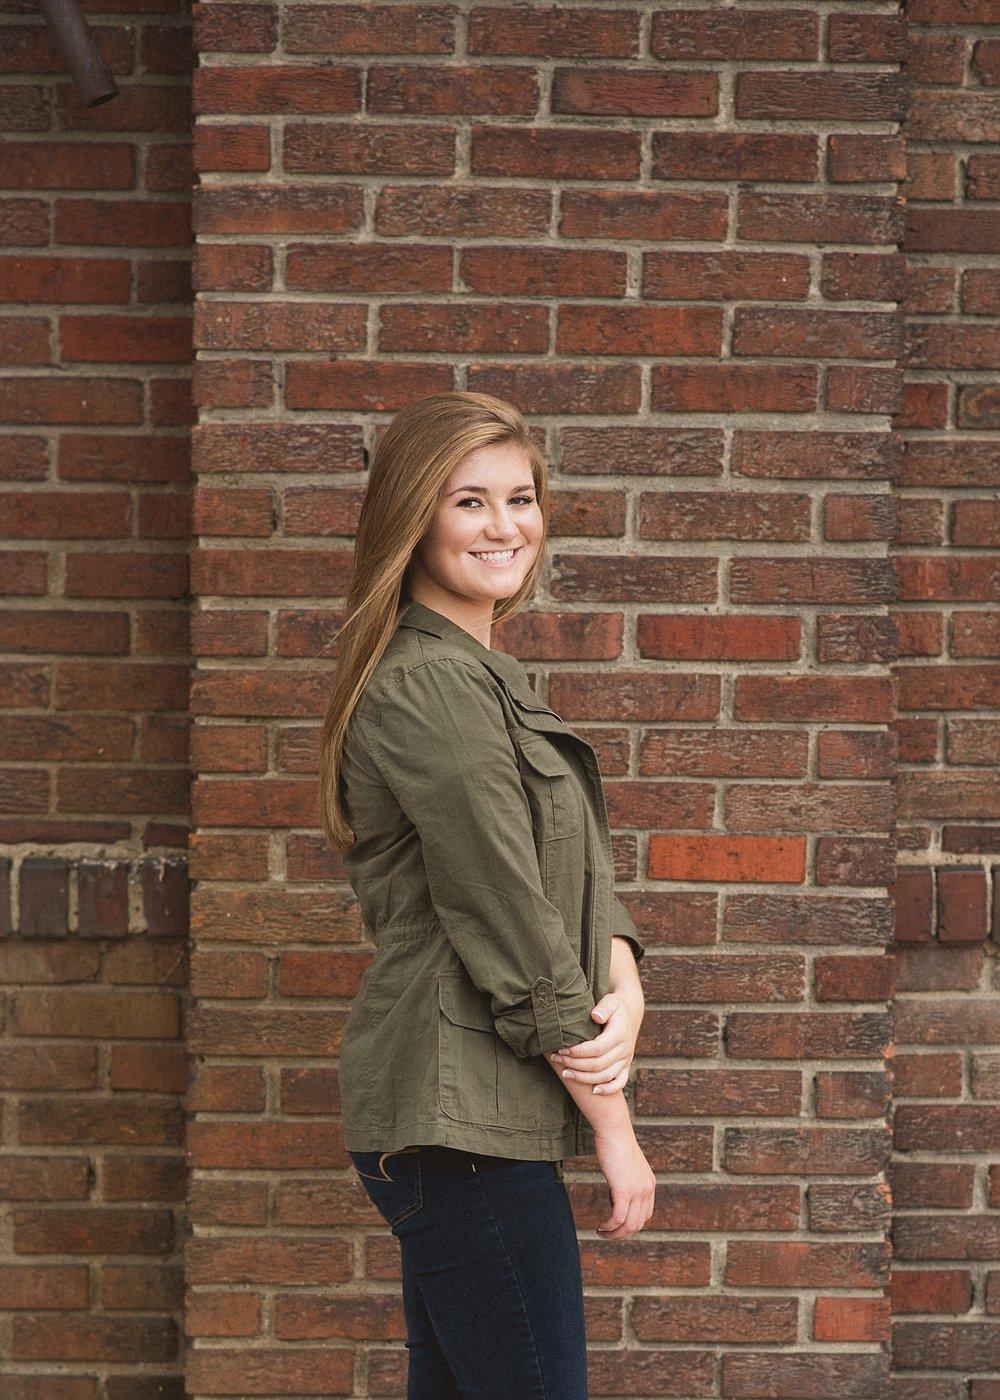 Elyse Rethlake Photography  - Portrait  Photographer - ElyseRethlake.com_0148.jpg